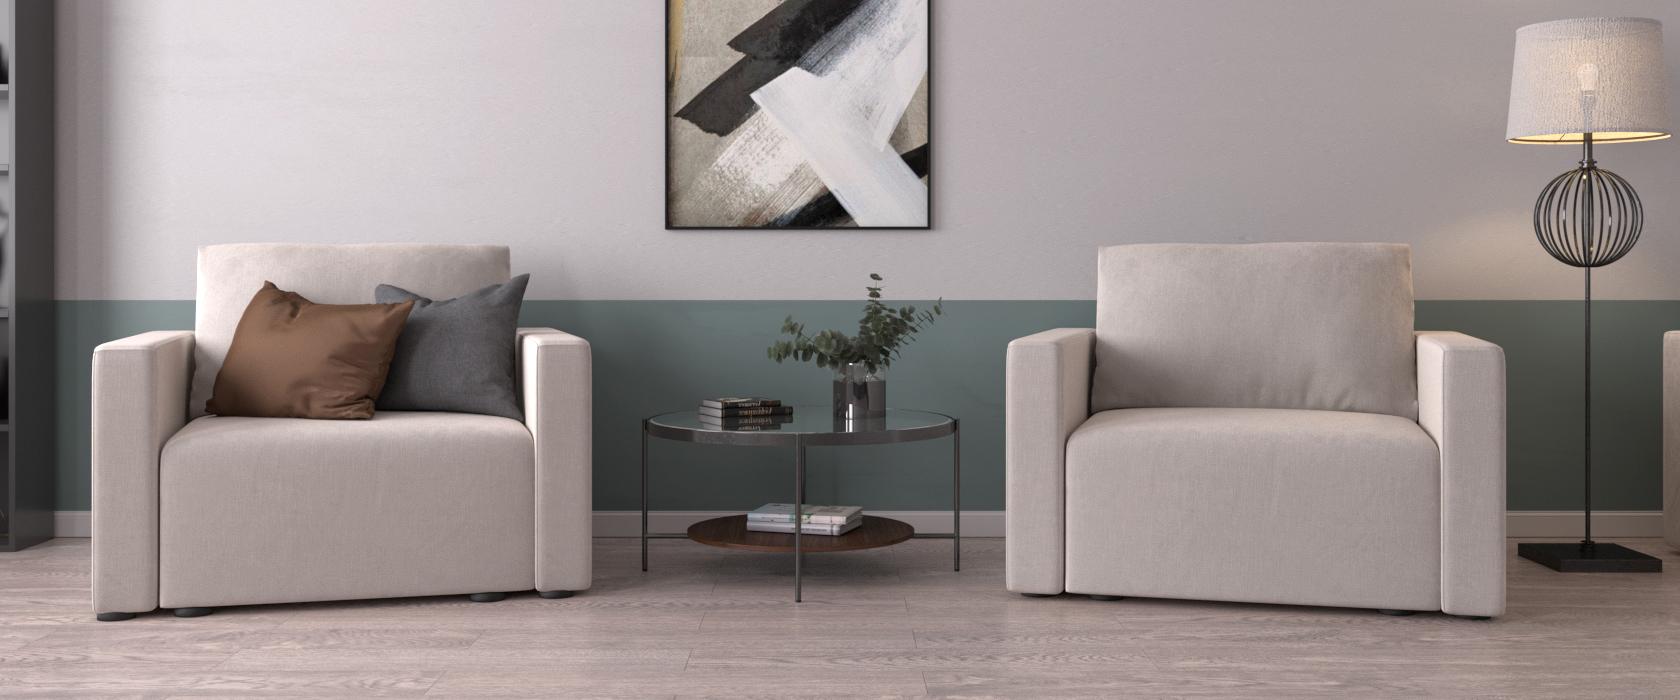 Кресло Greta - Фото 1 - Pufetto